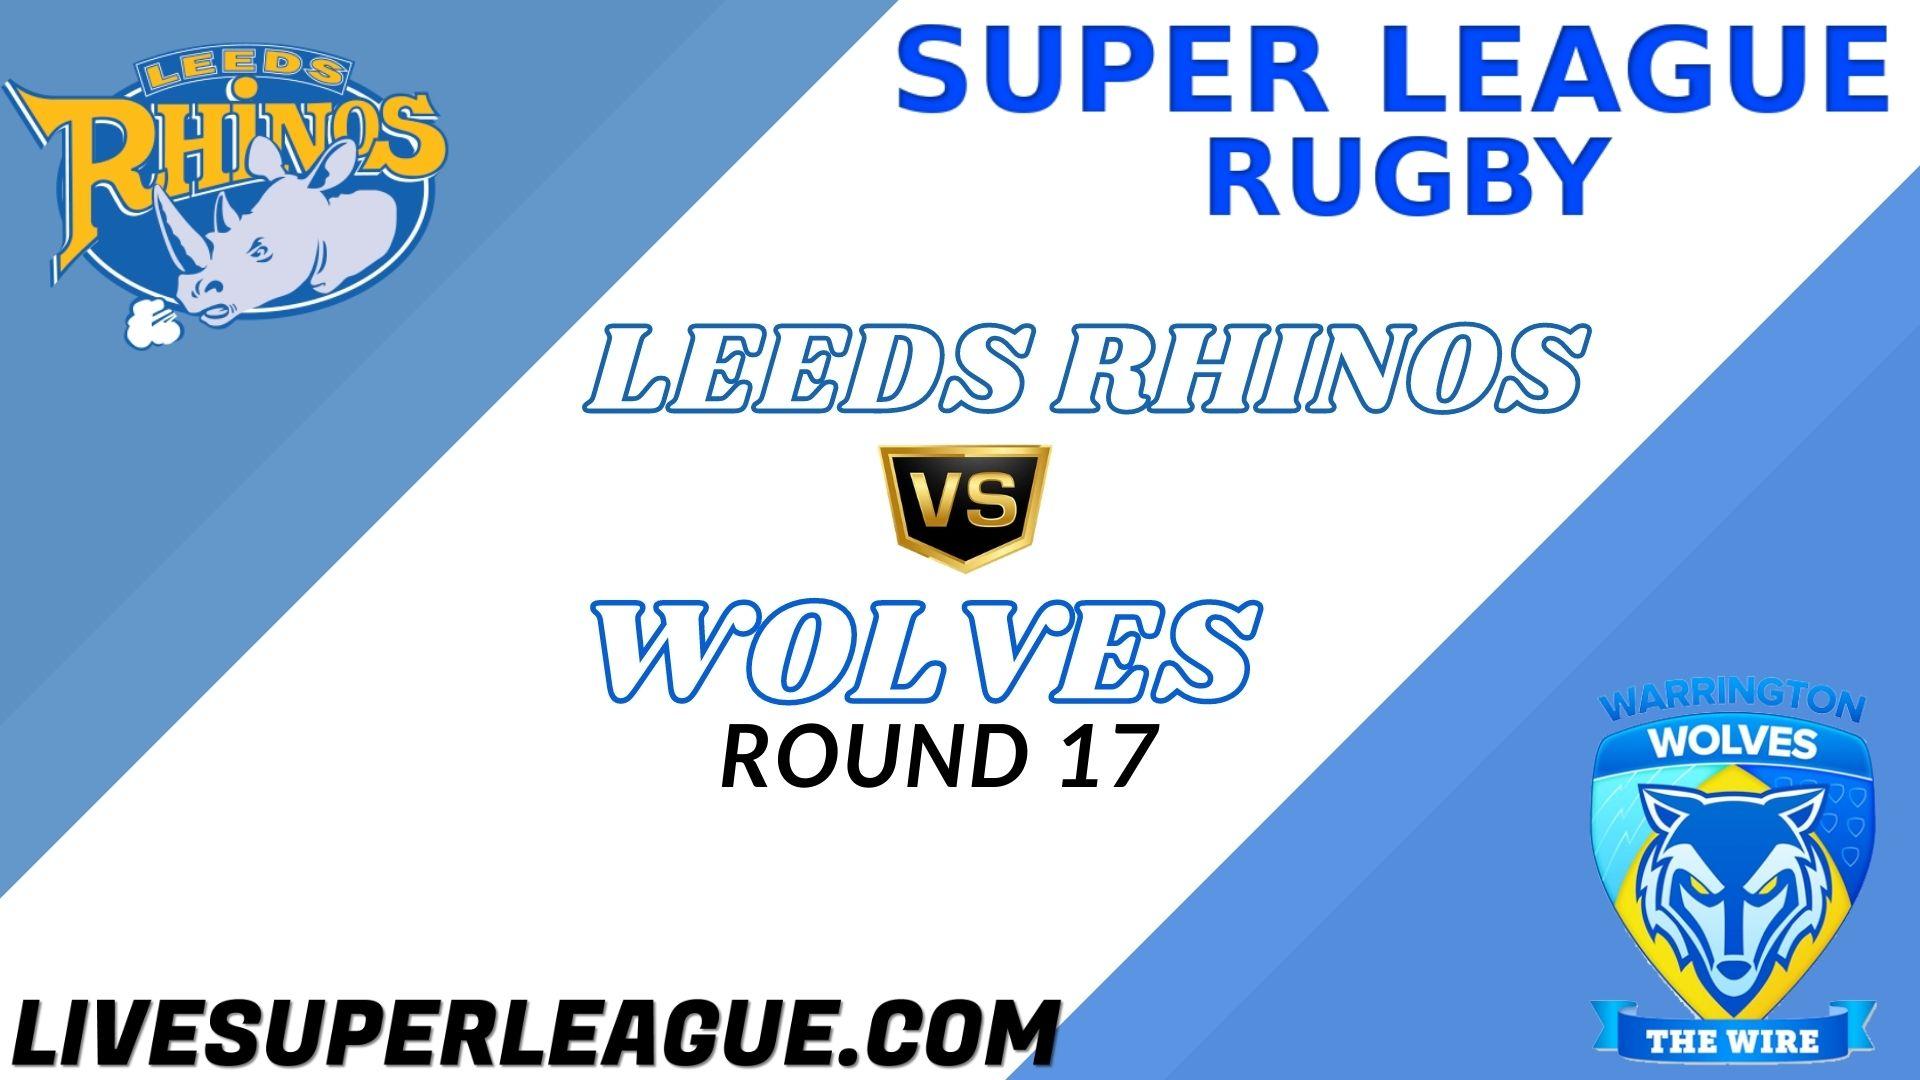 Leeds Rhinos Vs Wolves RD 17 Live Stream 2021 | Full Match Replay